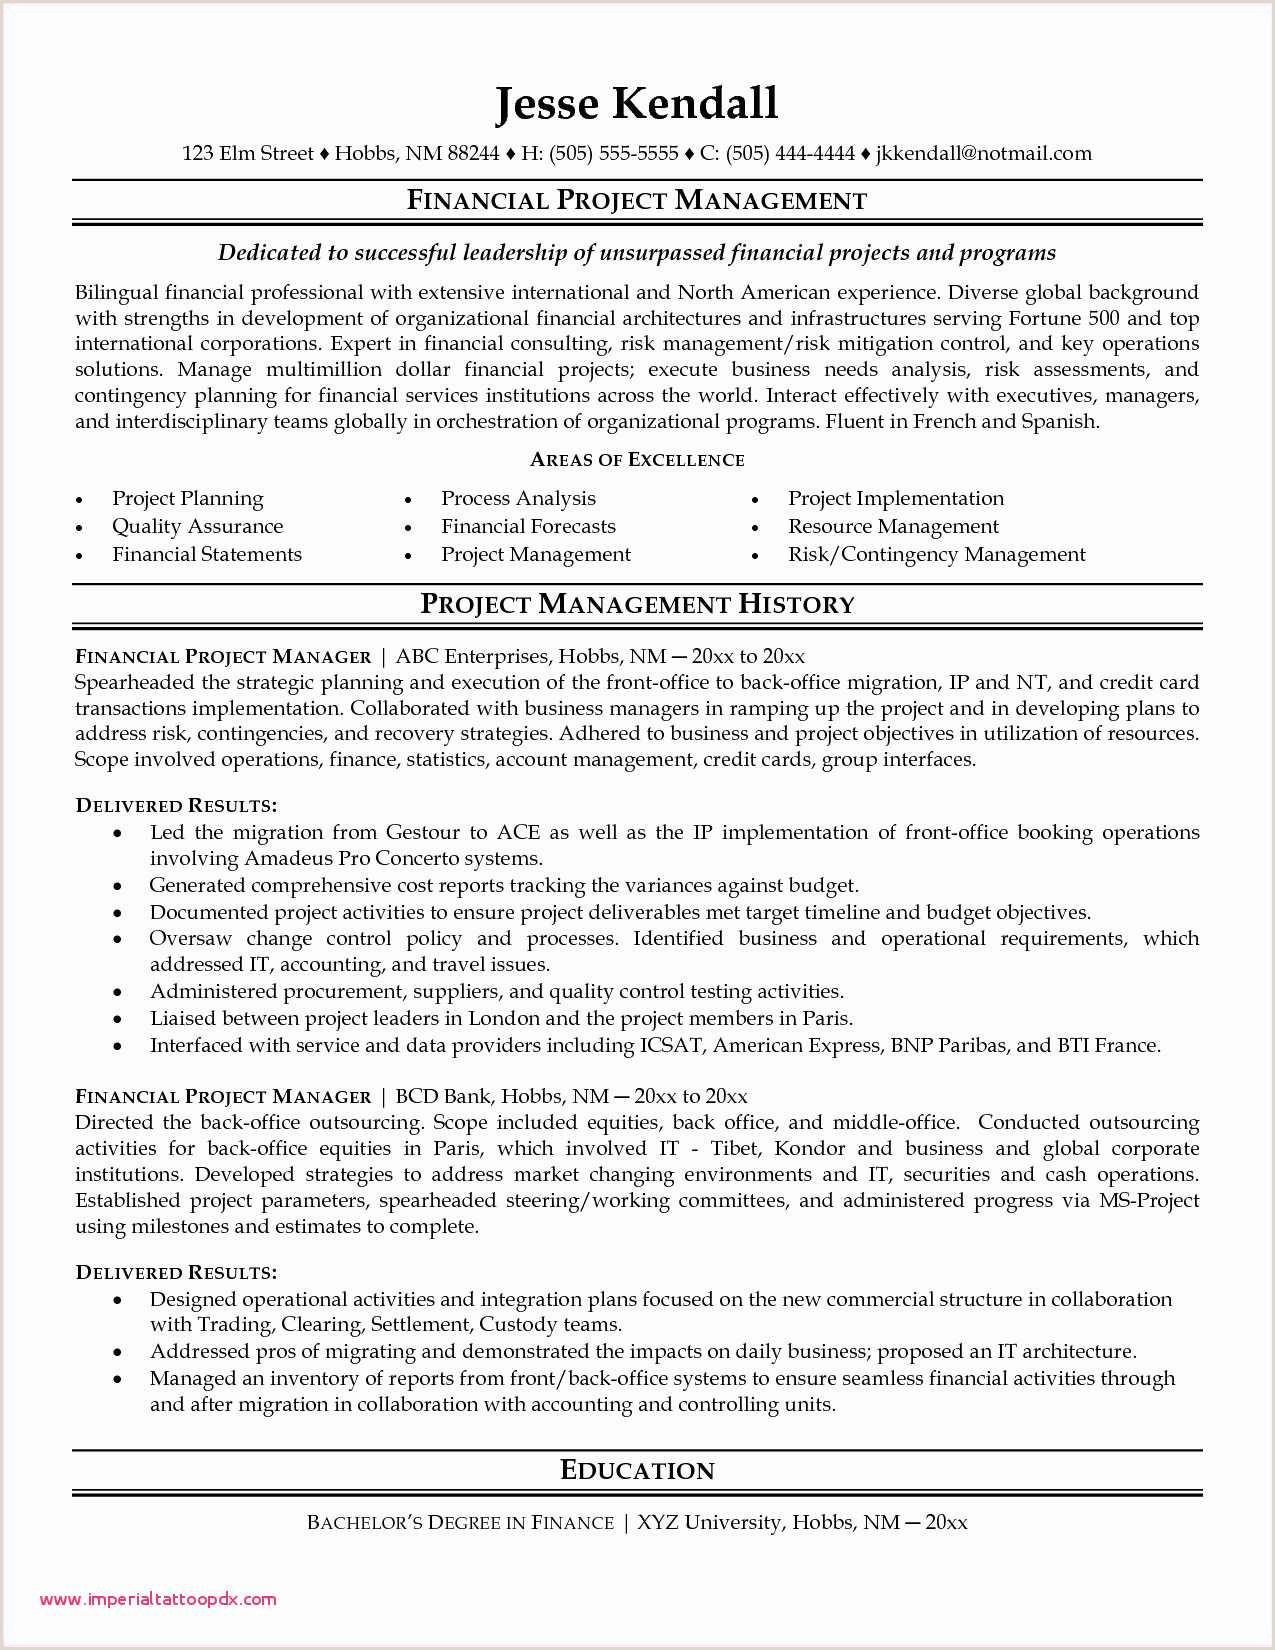 25 Free Construction Management Resume Objective